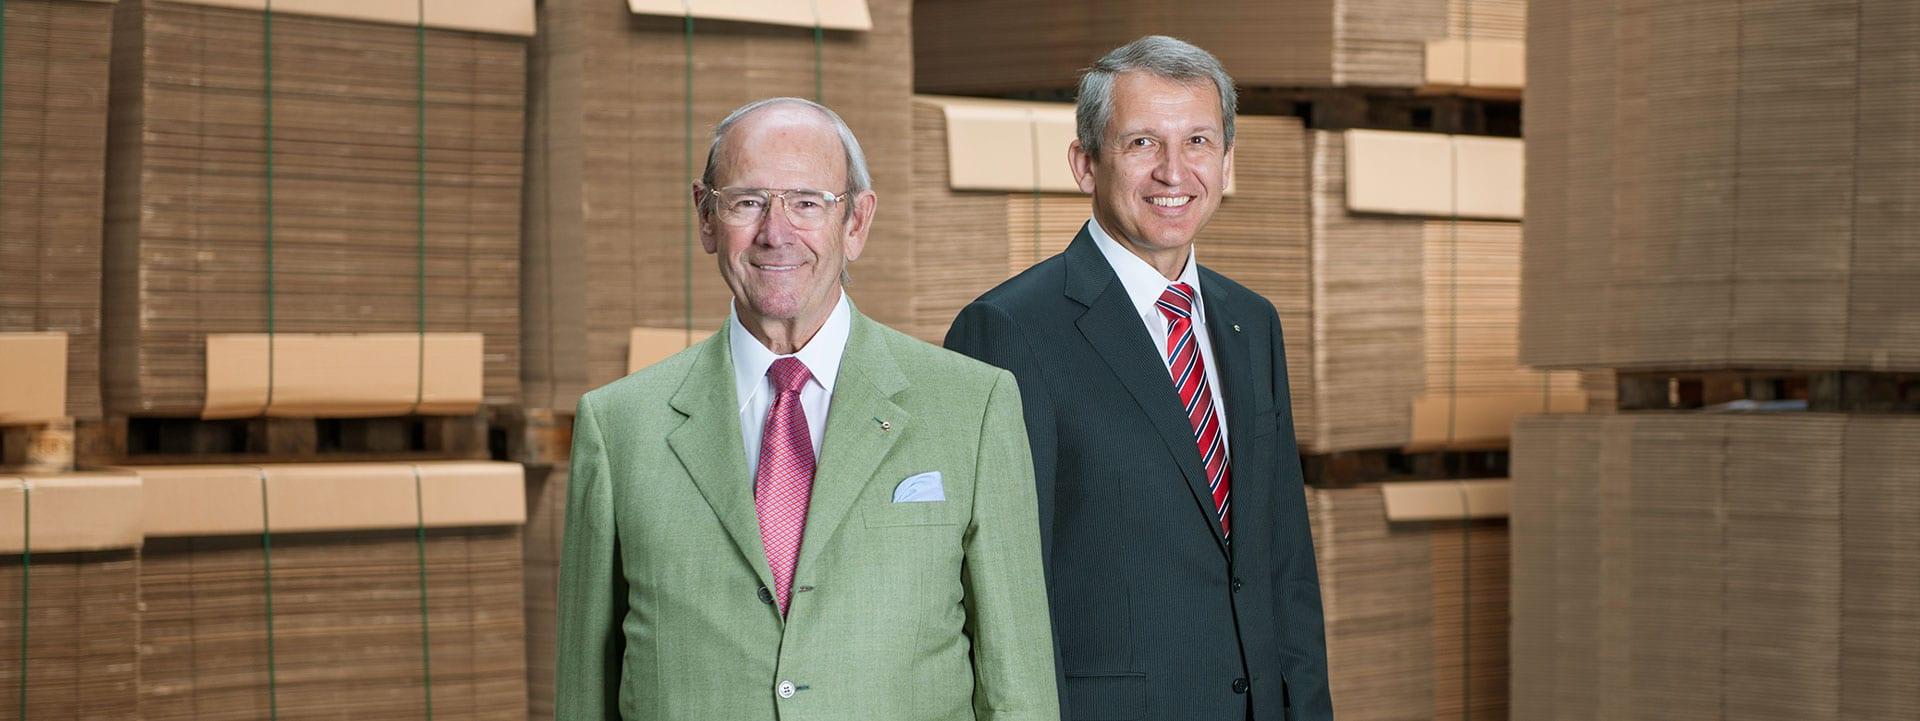 Alwin J. Kolb et Dr.-Ing. Bernhard Ruffing